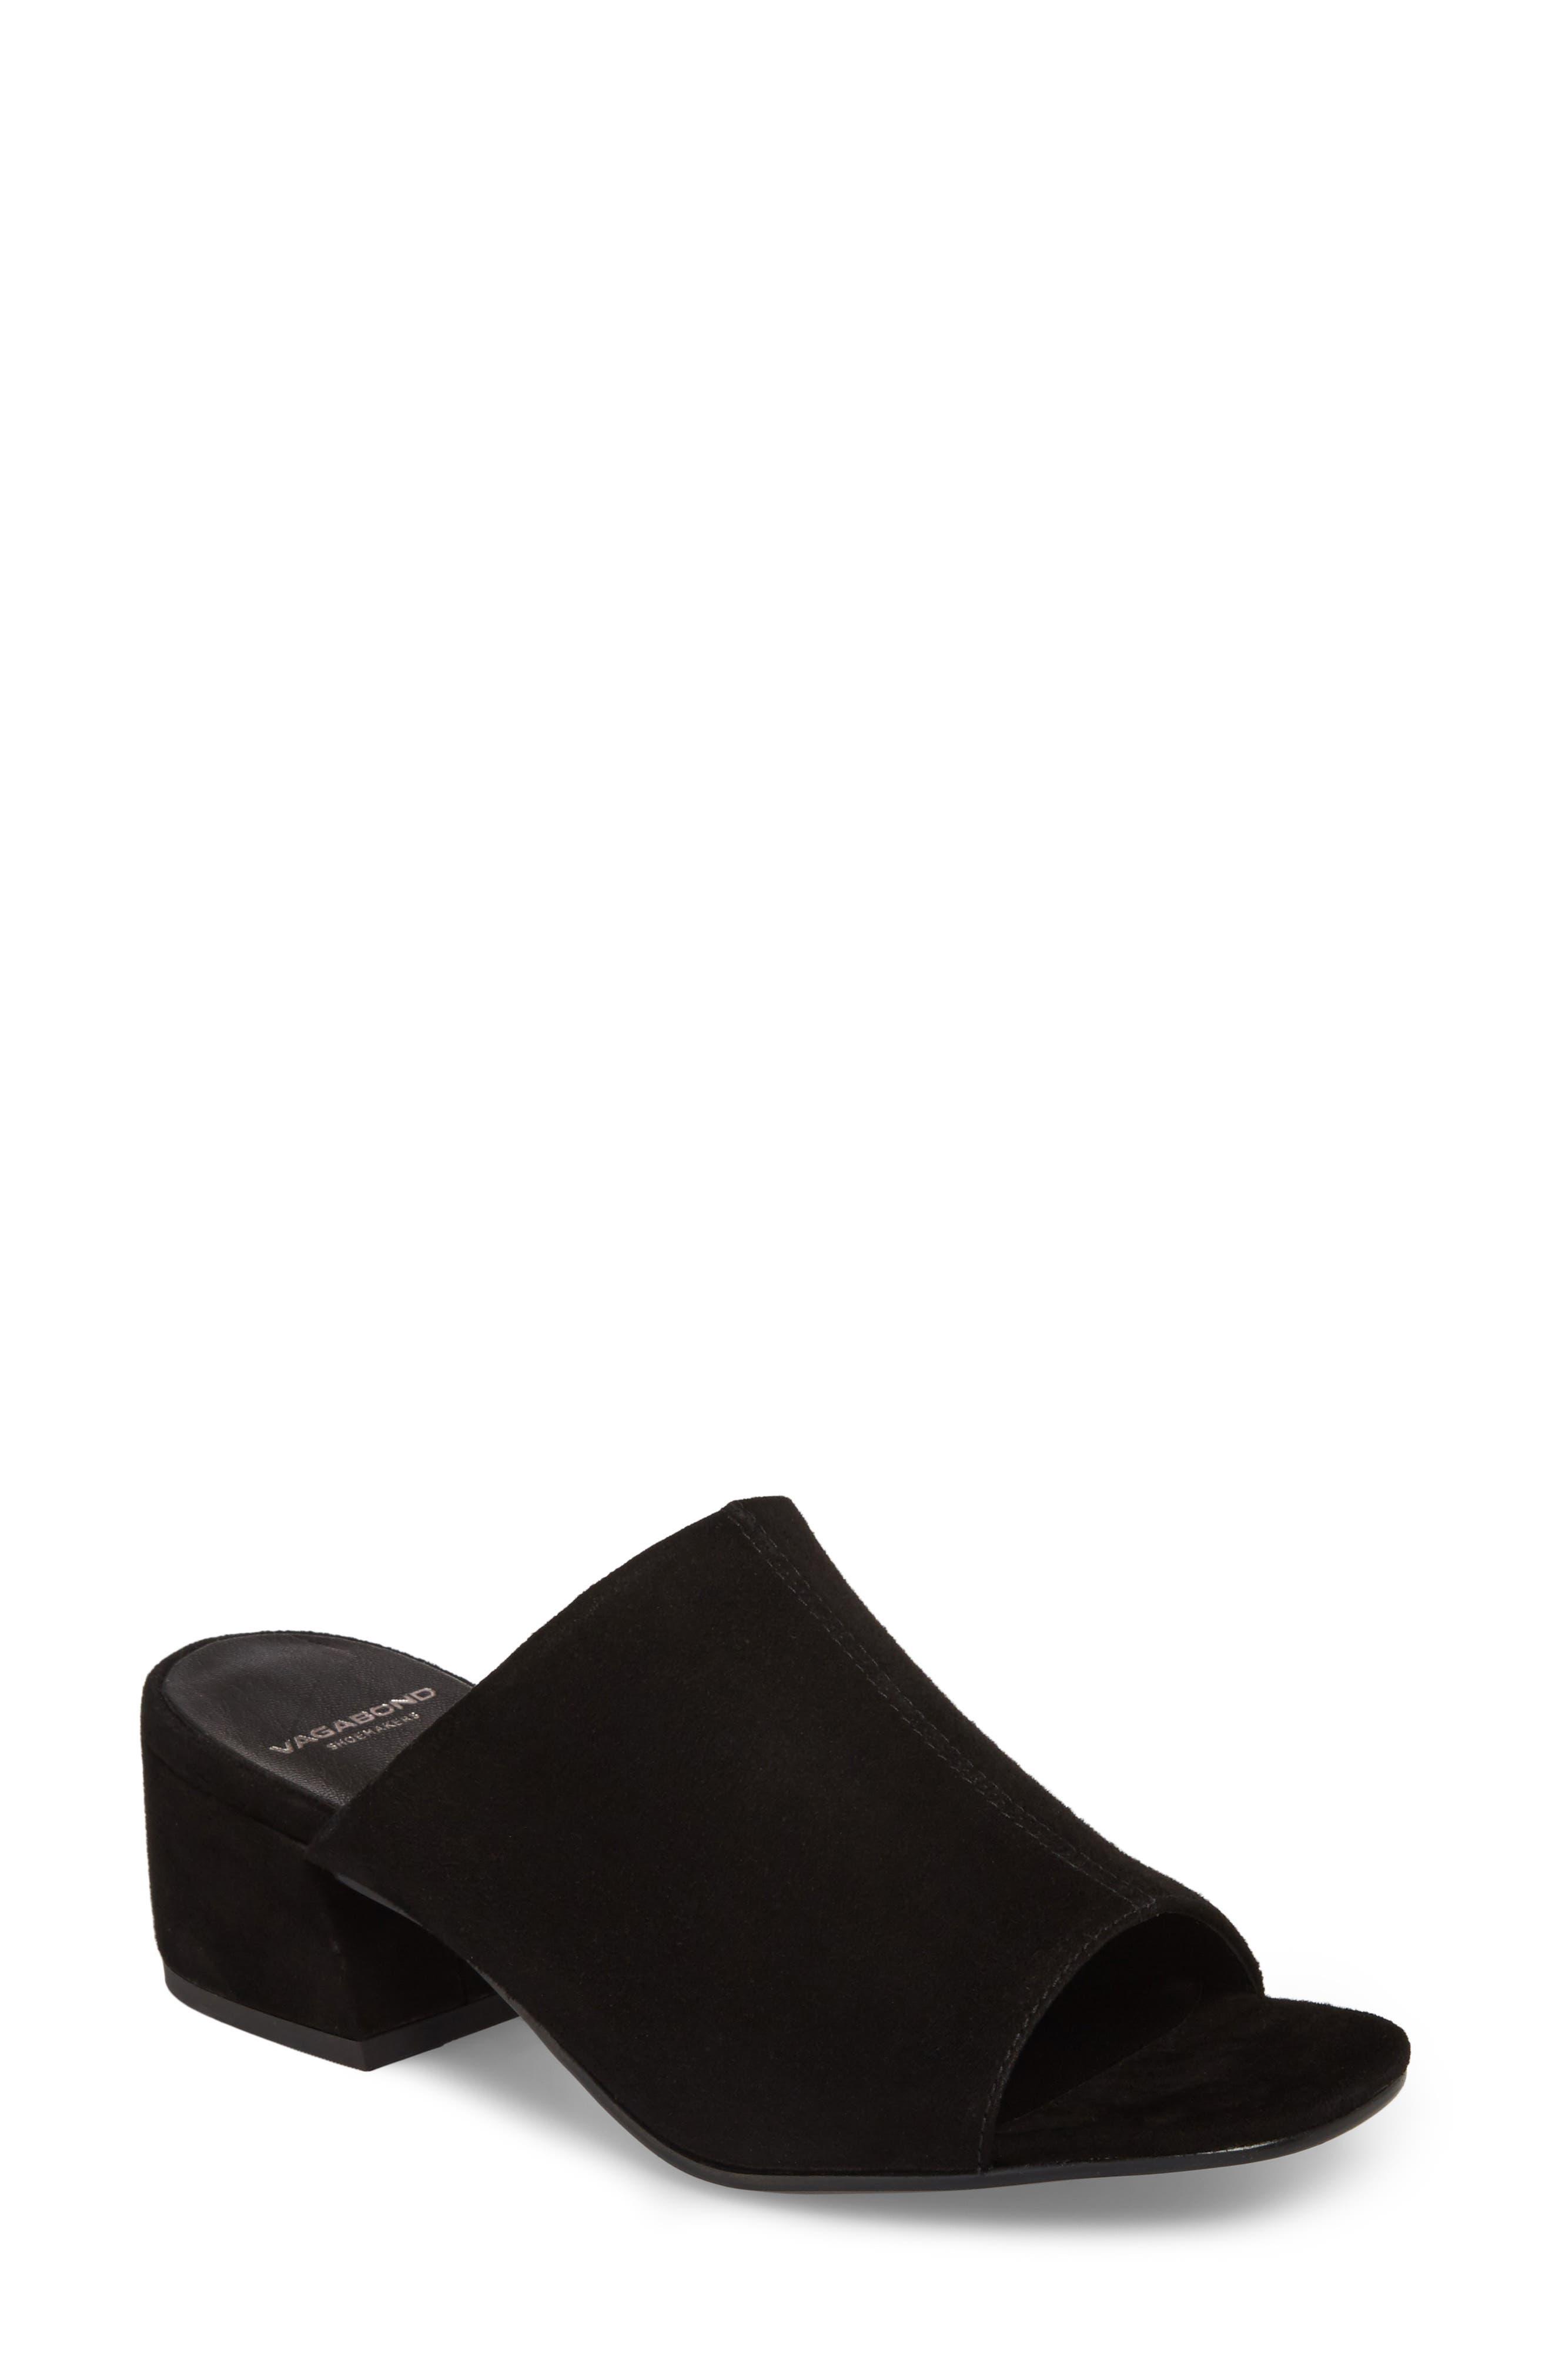 Saide Slide Sandal,                             Main thumbnail 1, color,                             BLACK SUEDE